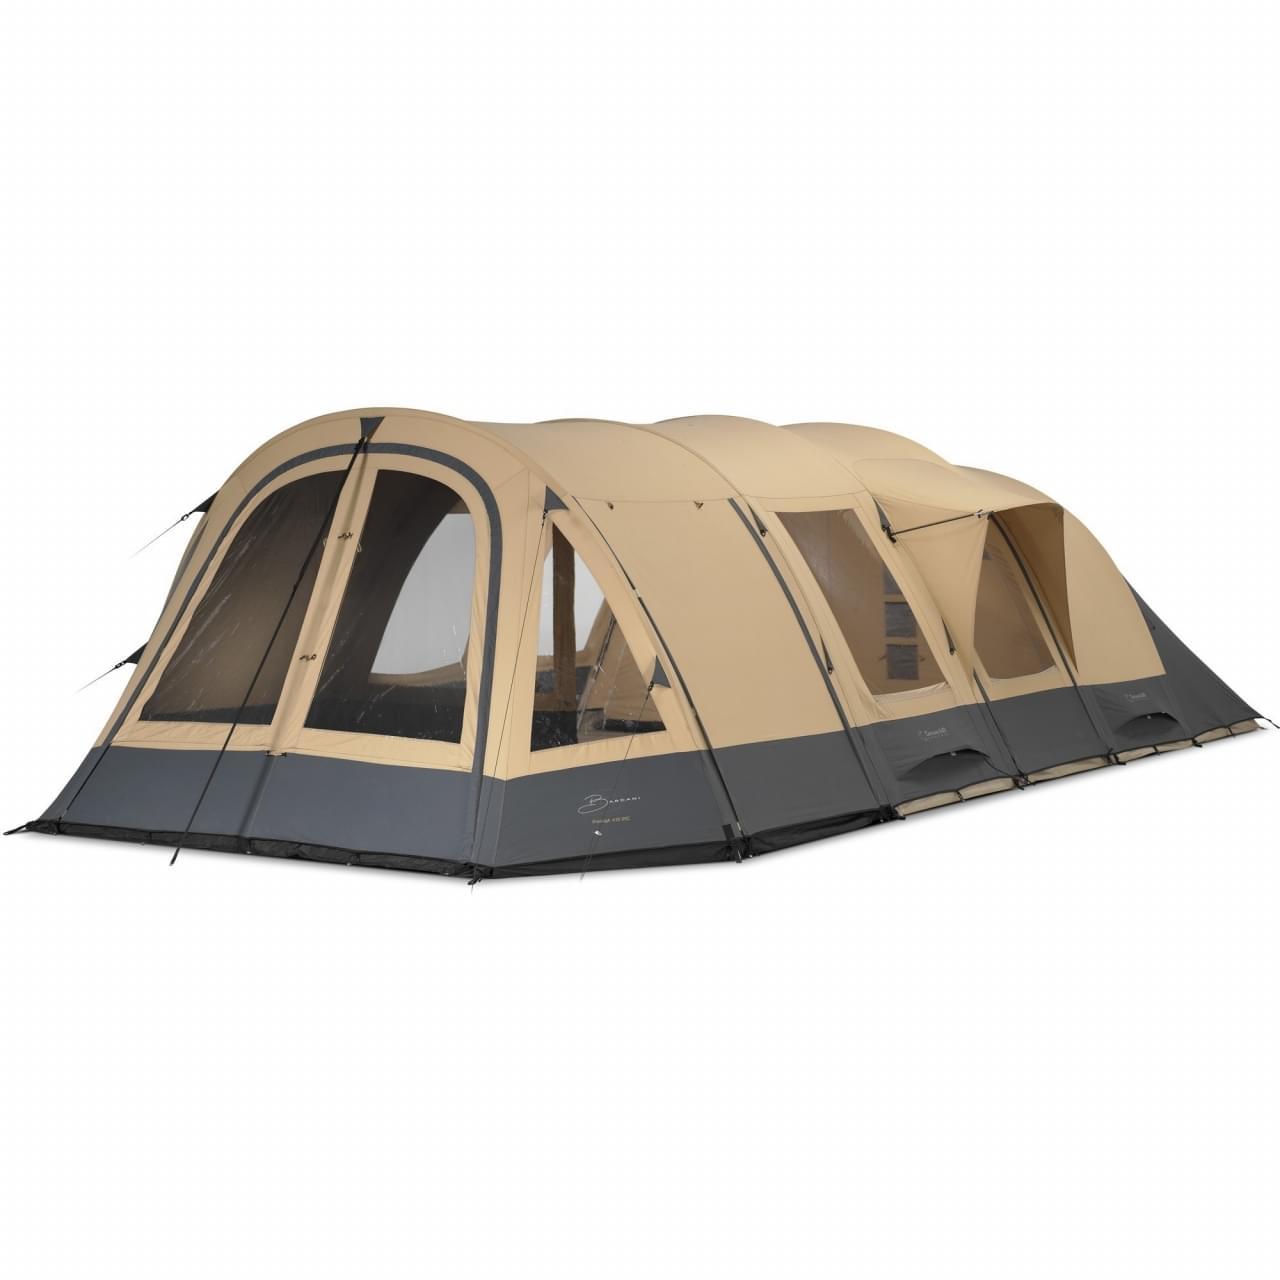 Bardani Prestige 410 RSC - 5 Persoons Tent